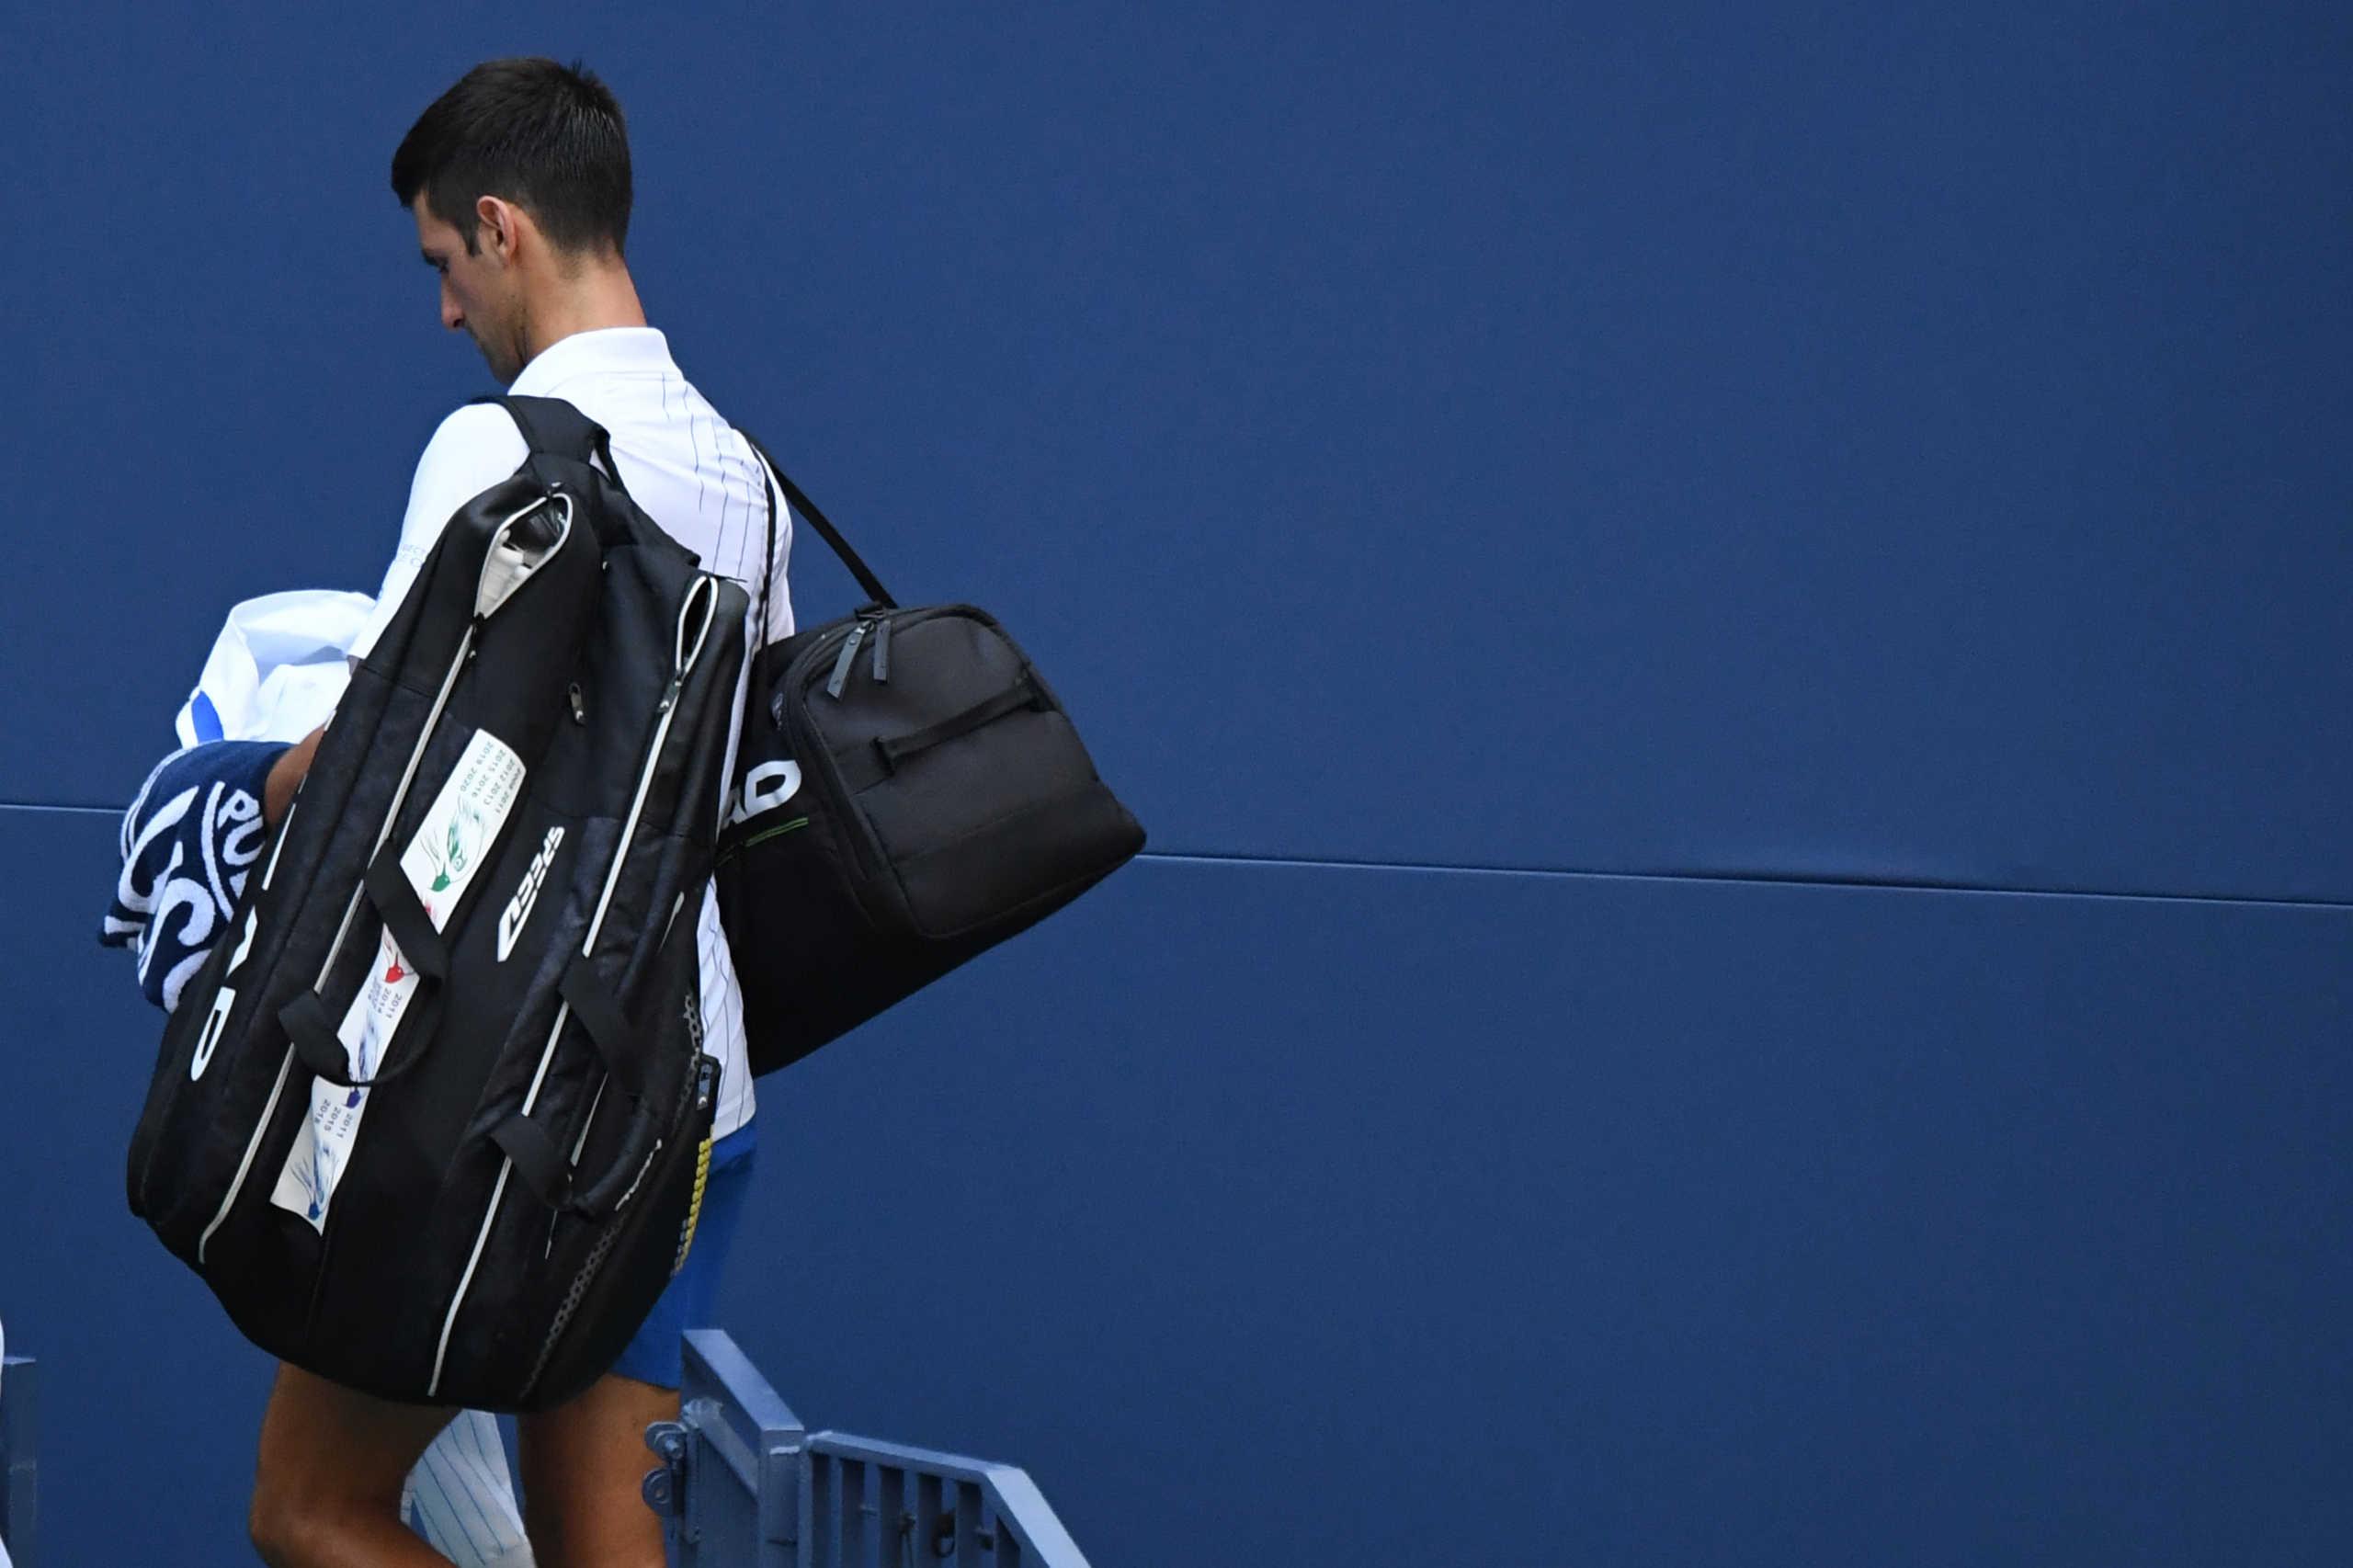 US Open: Αφαίρεση βαθμών και χρηματικού επάθλου για τον Τζόκοβιτς παρά τη συγγνώμη